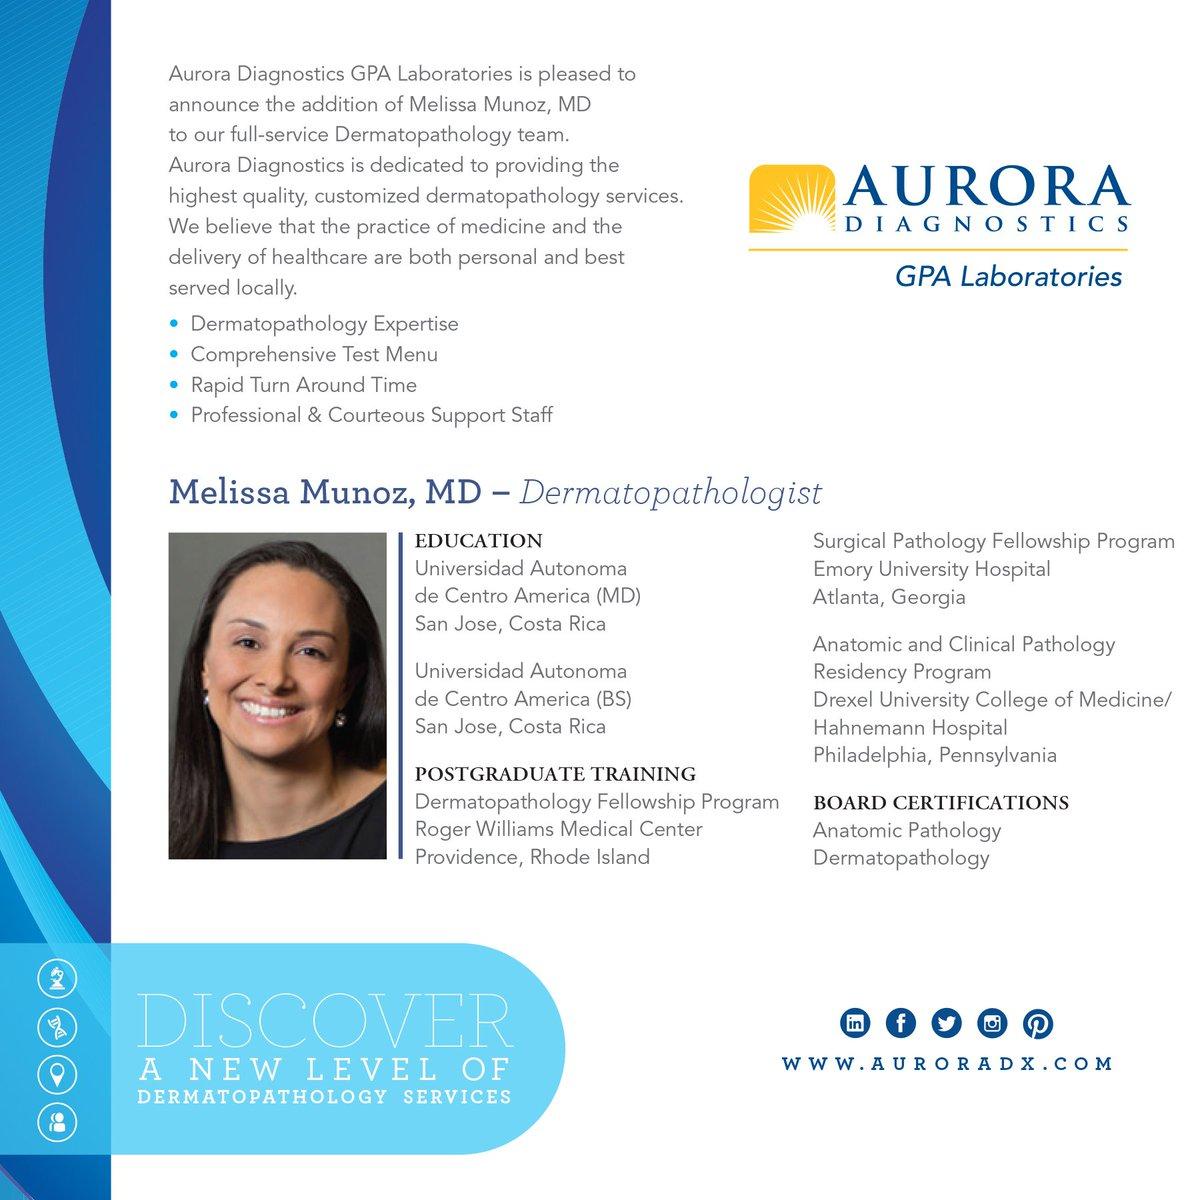 Boston university dermatopathology fellowship